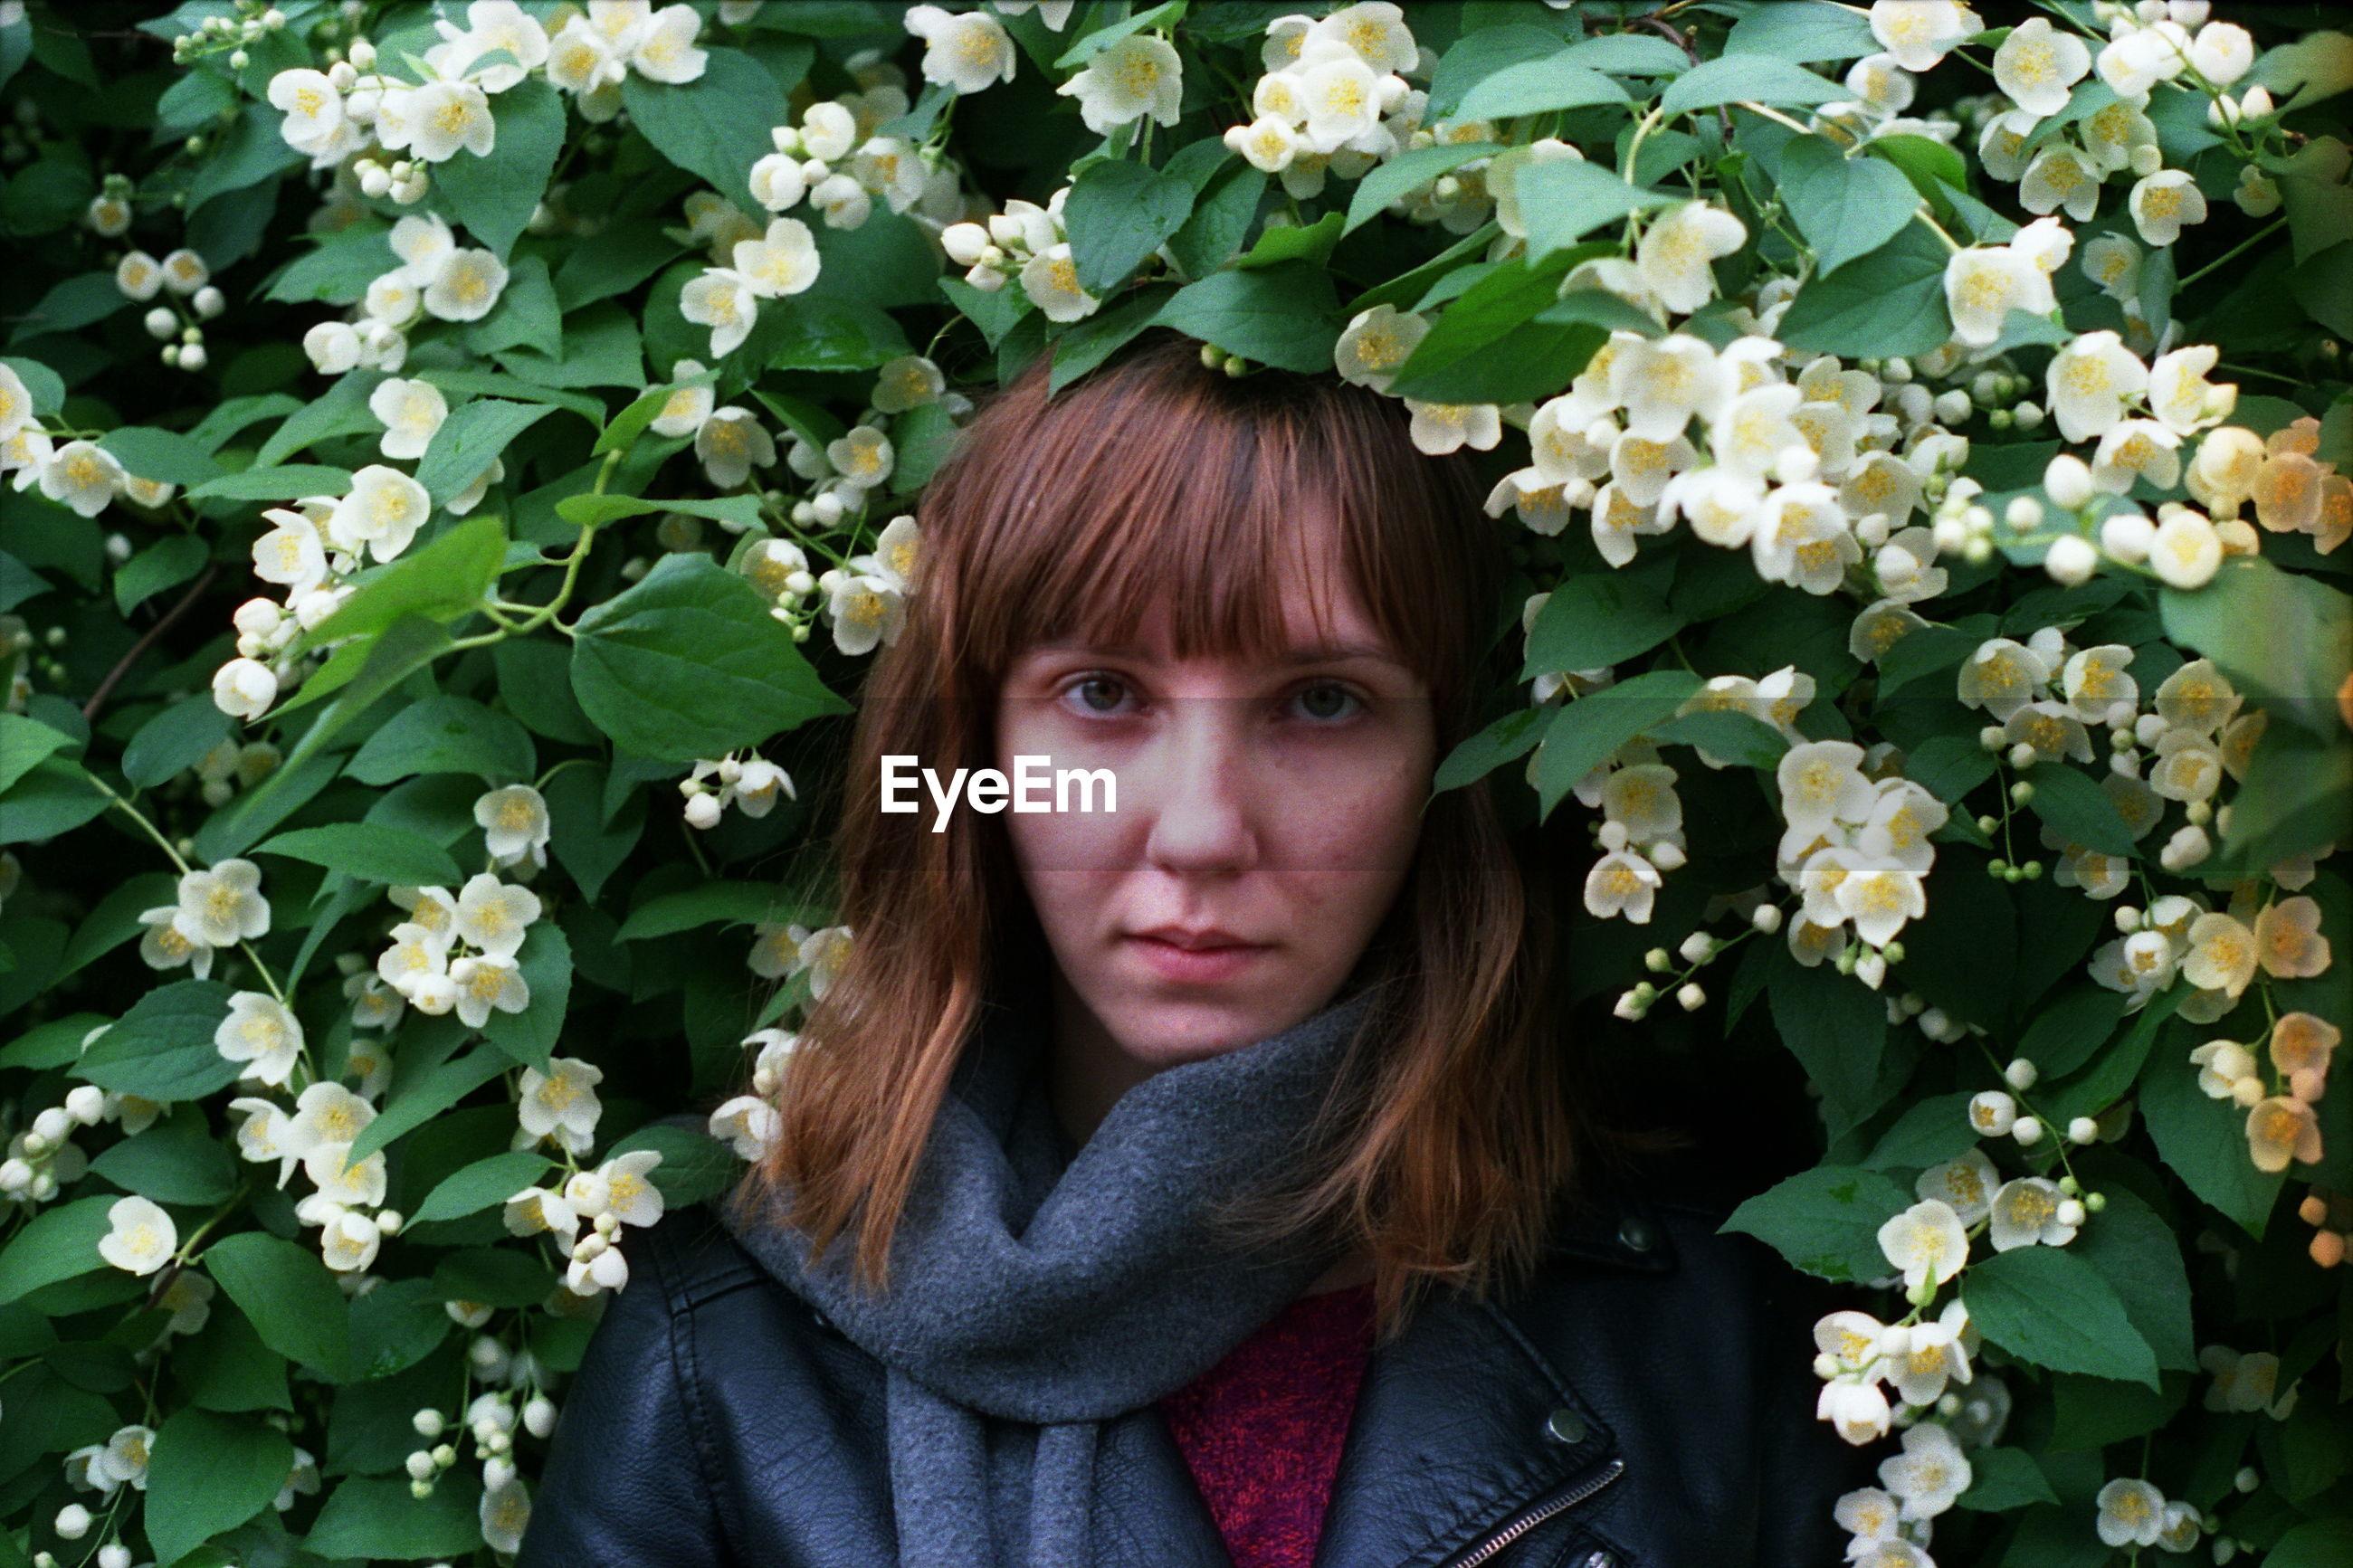 Close-up portrait of young woman amidst flower plants